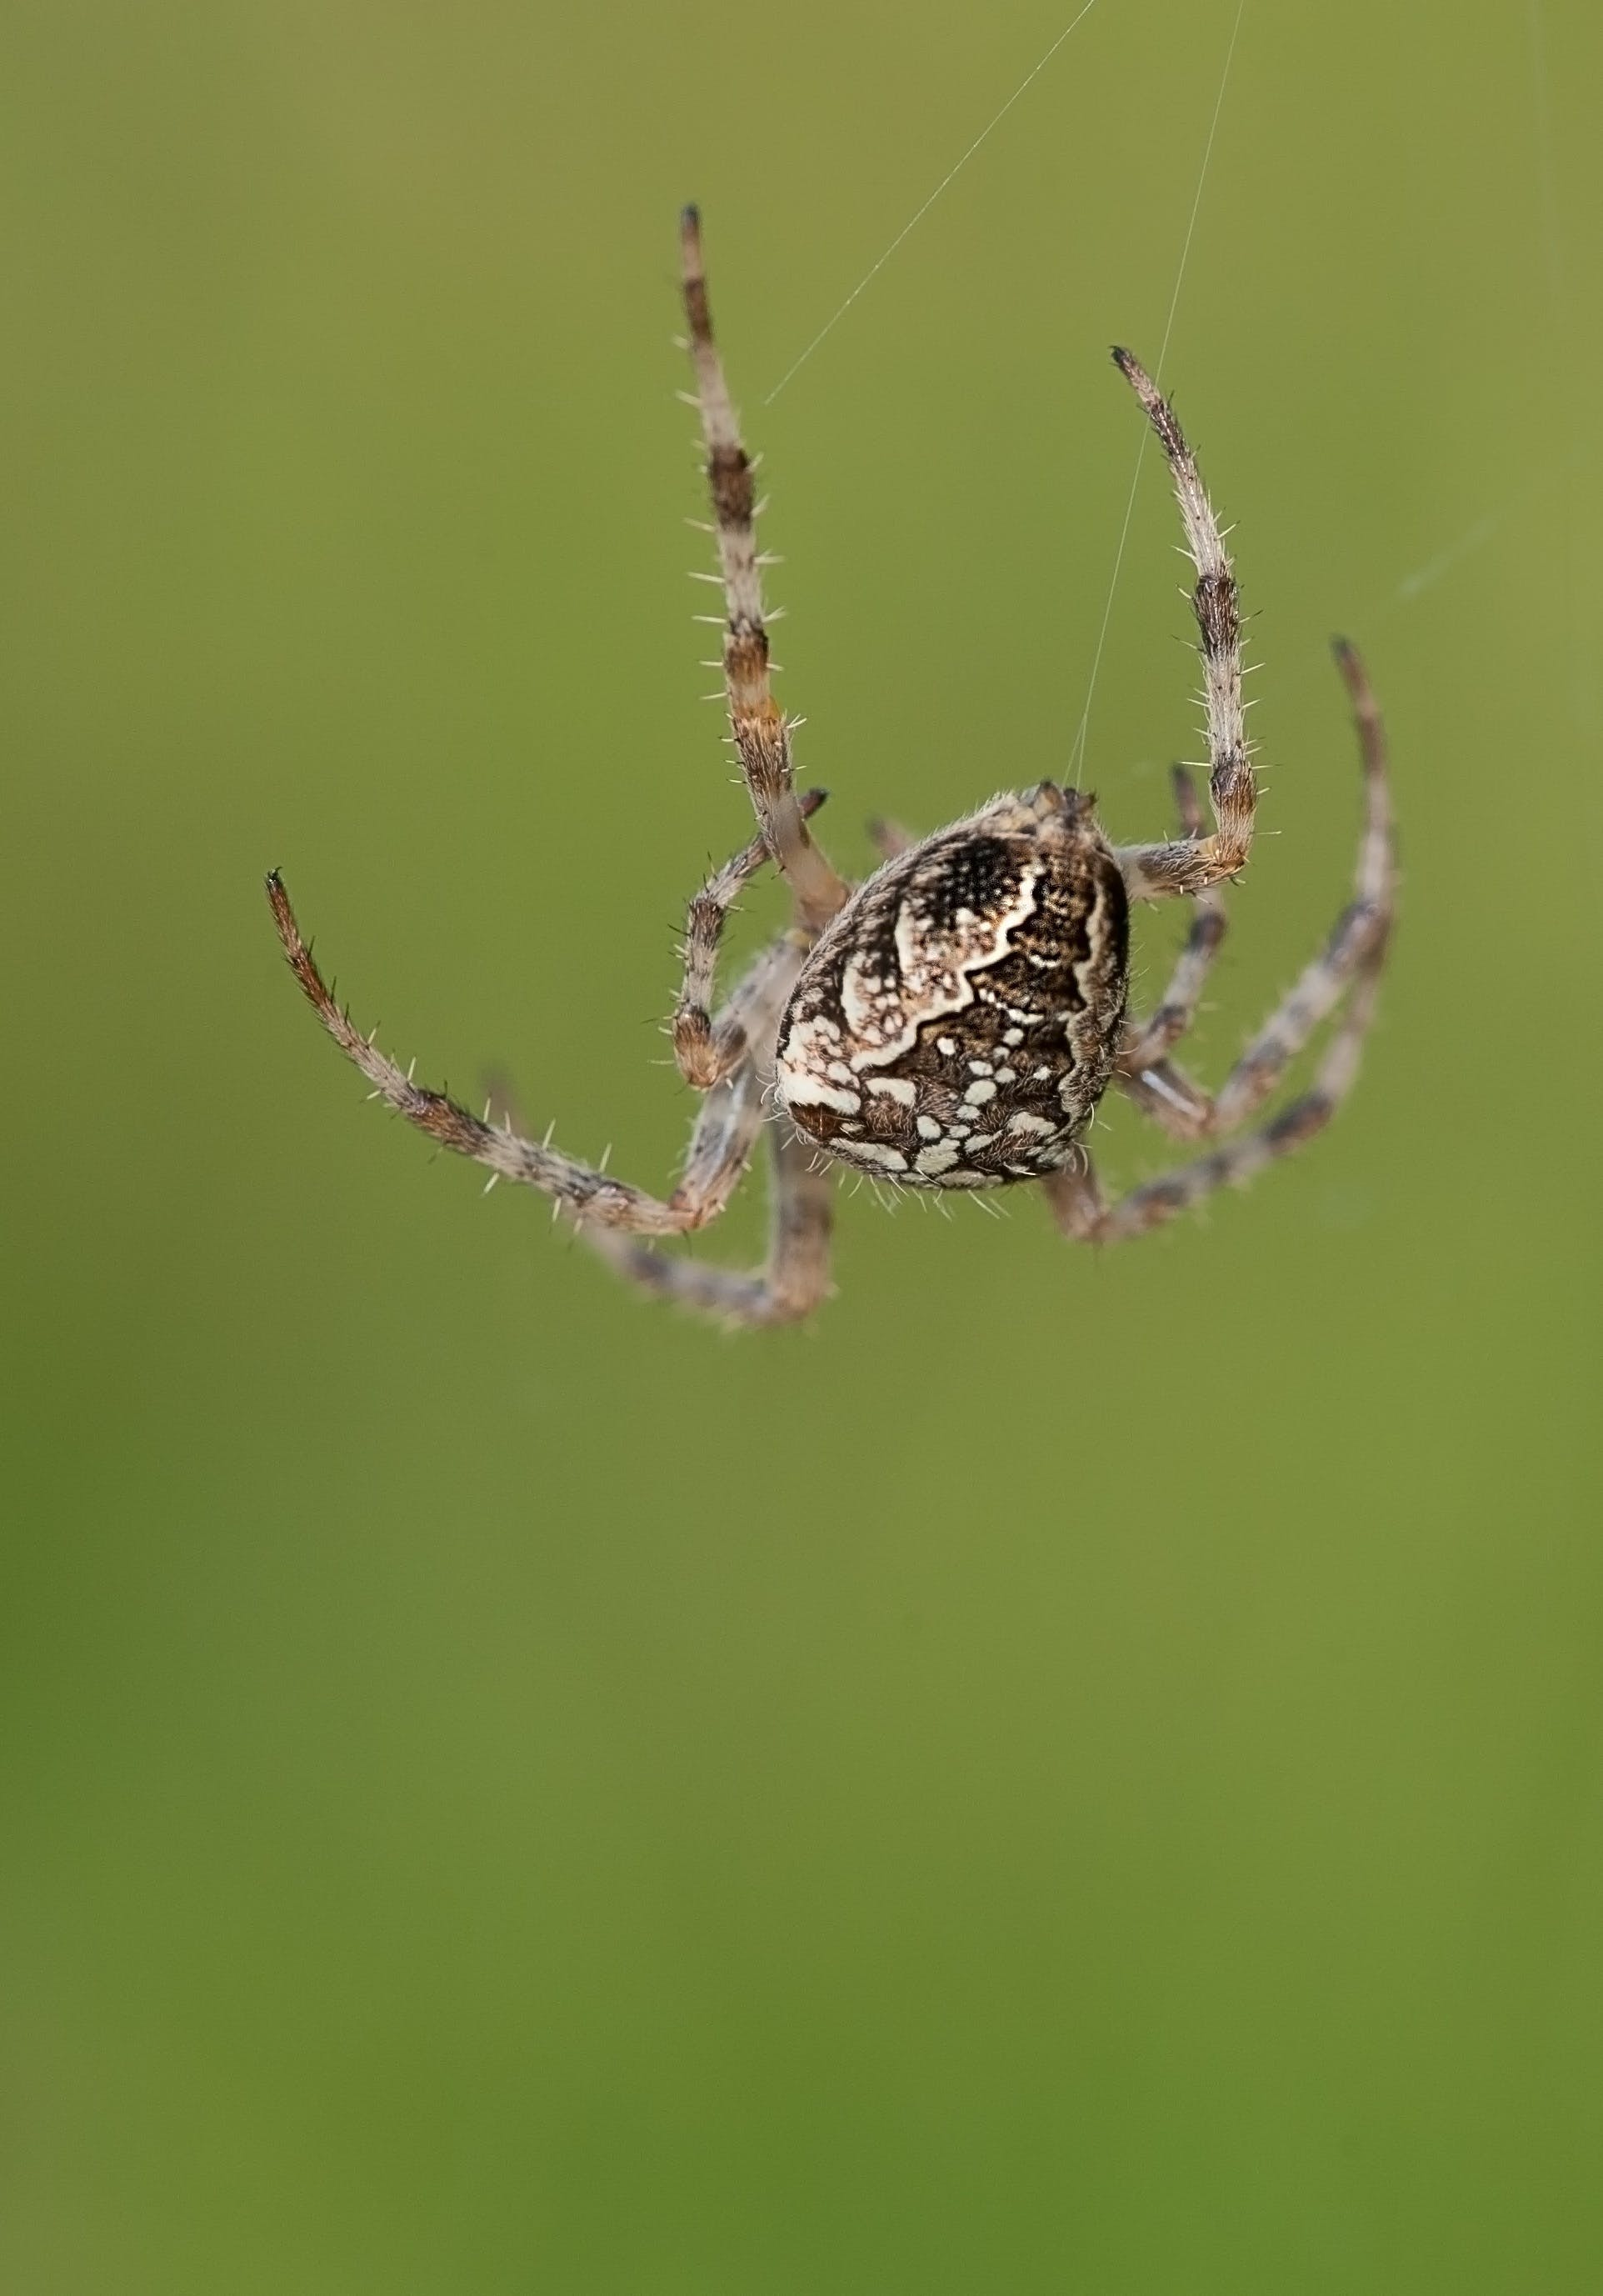 Kostenloses Stock Foto zu tier, insekt, makro, spinnennetz